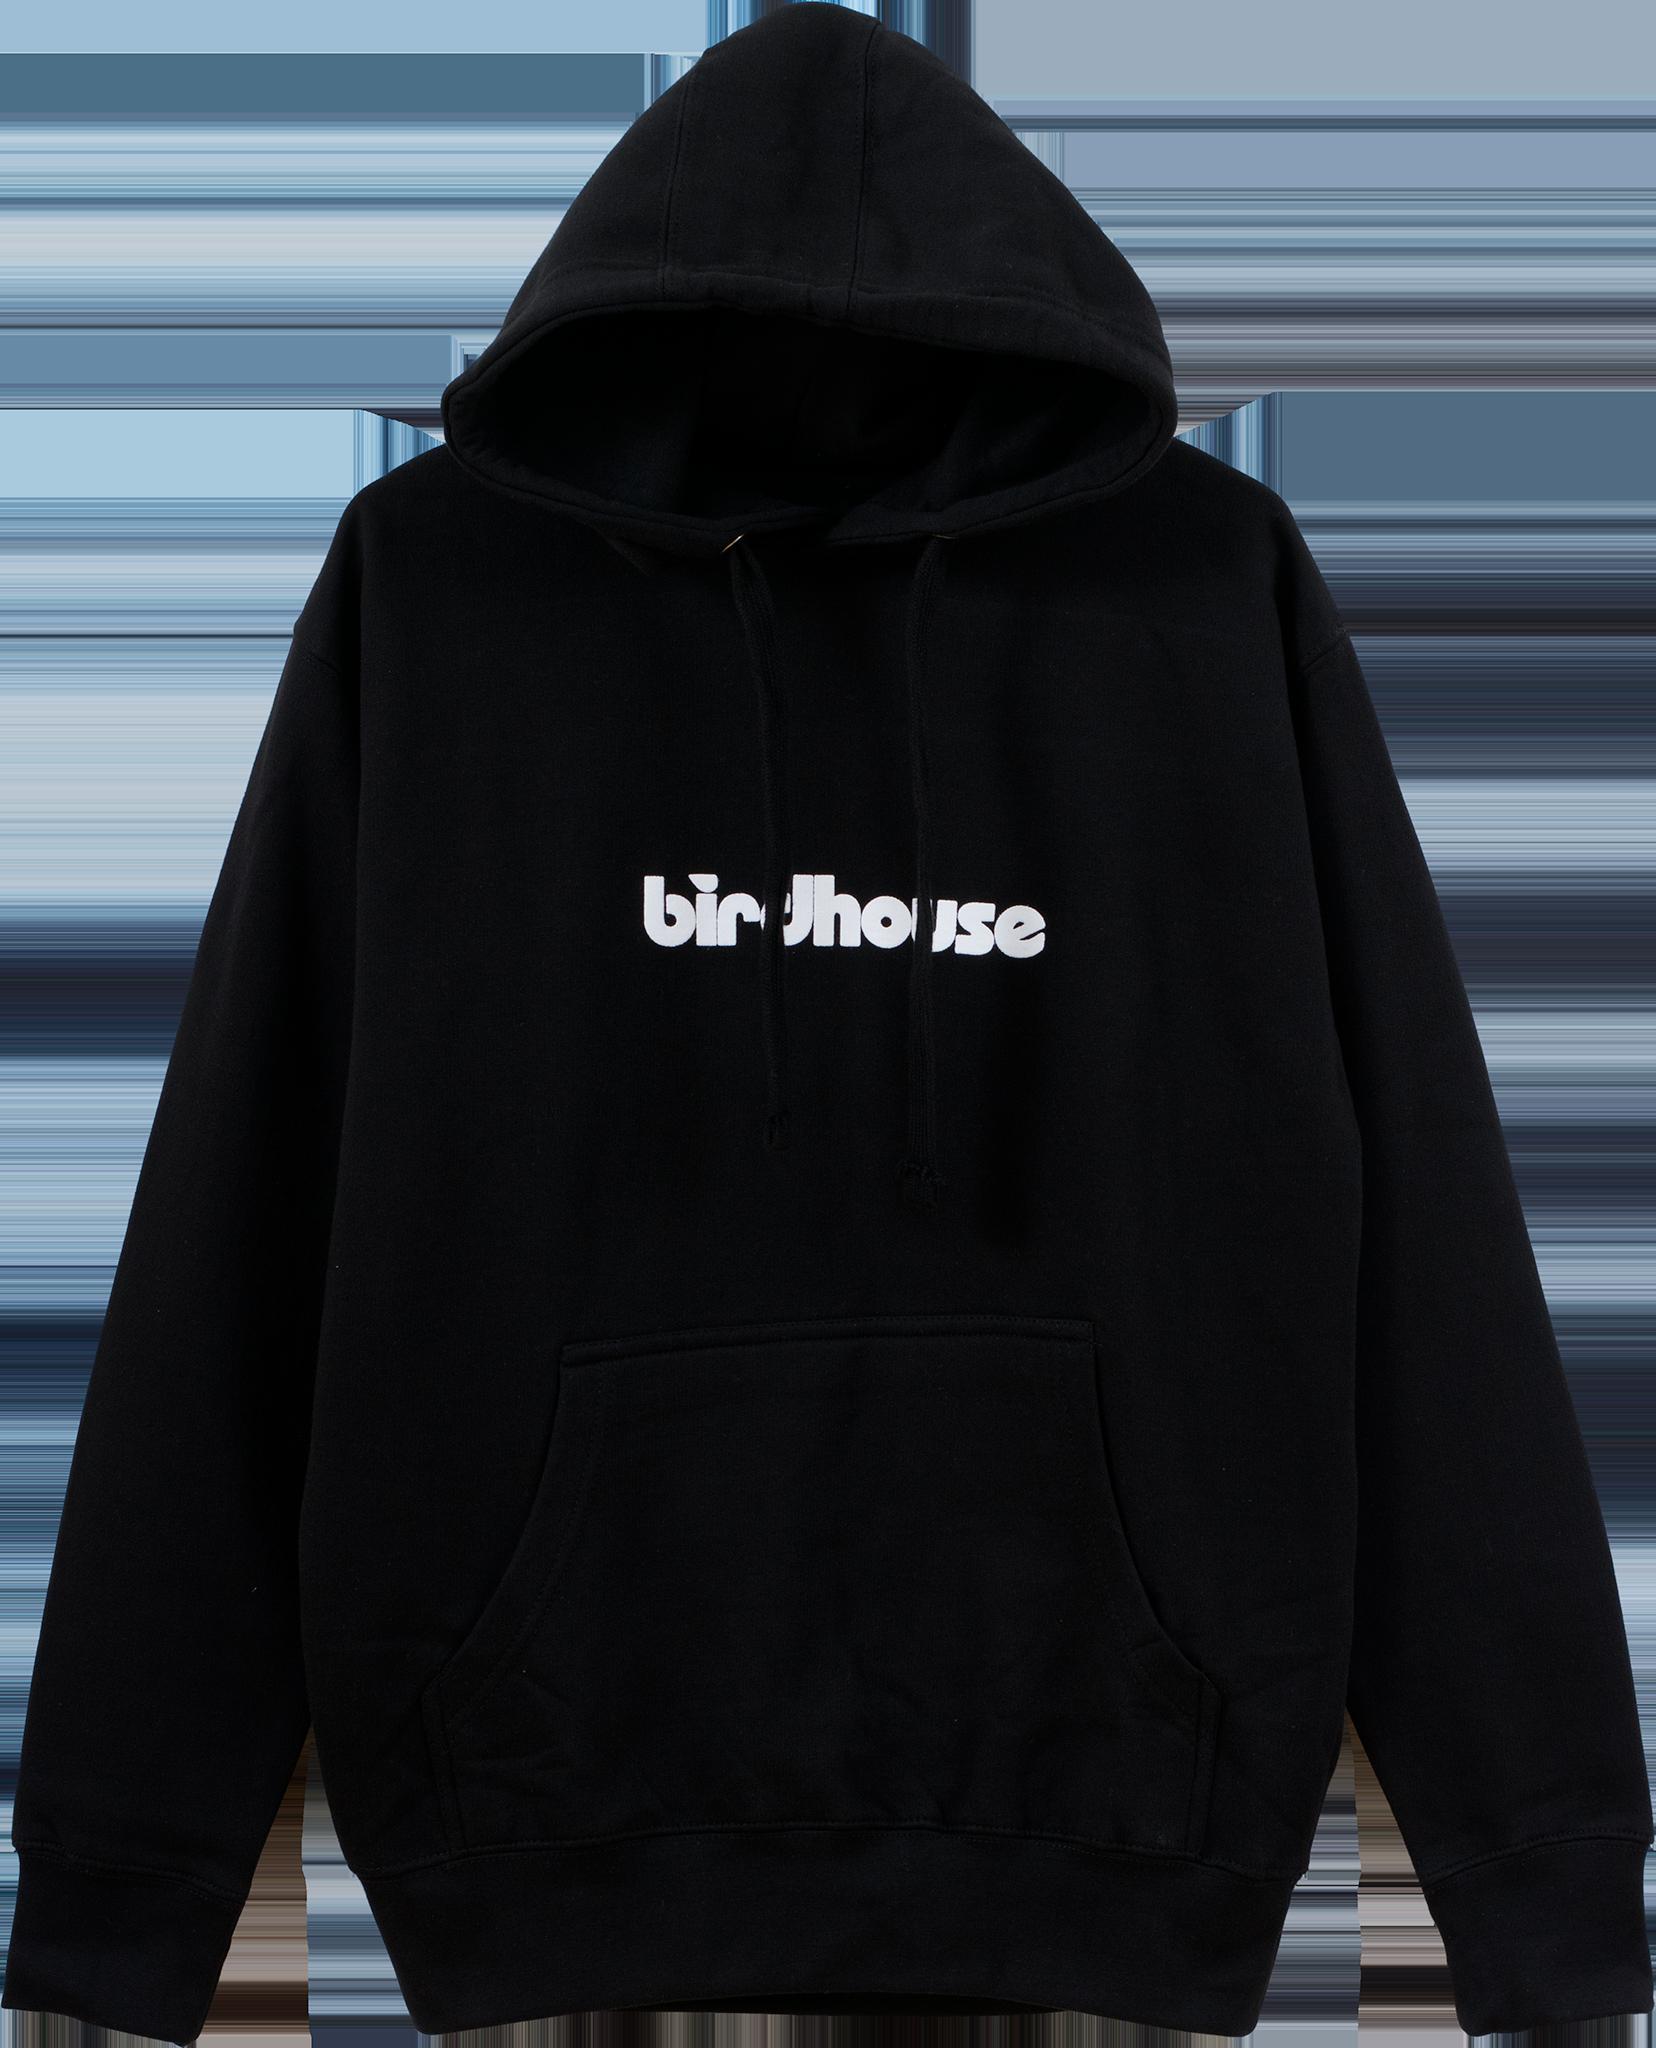 Hoodie clipart crewneck sweatshirt. Birdhouse hoodies stacked logo